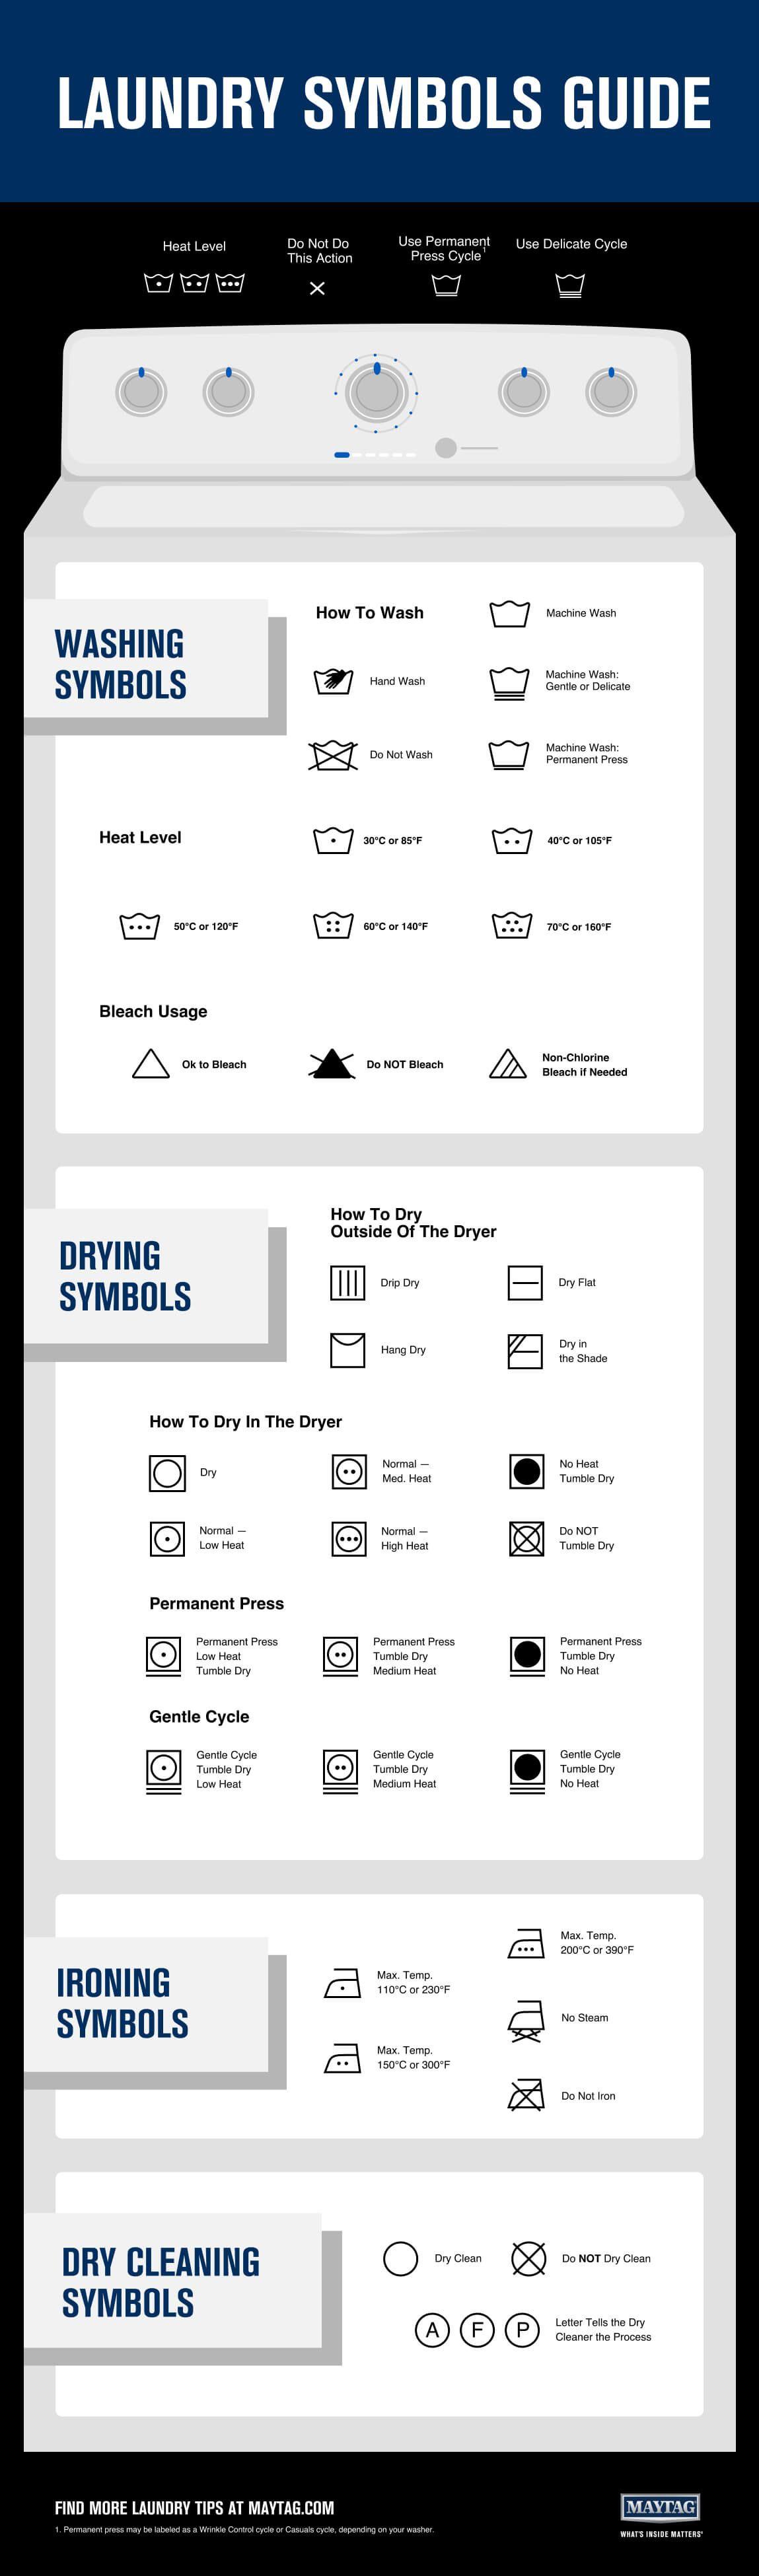 Decoding Laundry Symbols Maytag